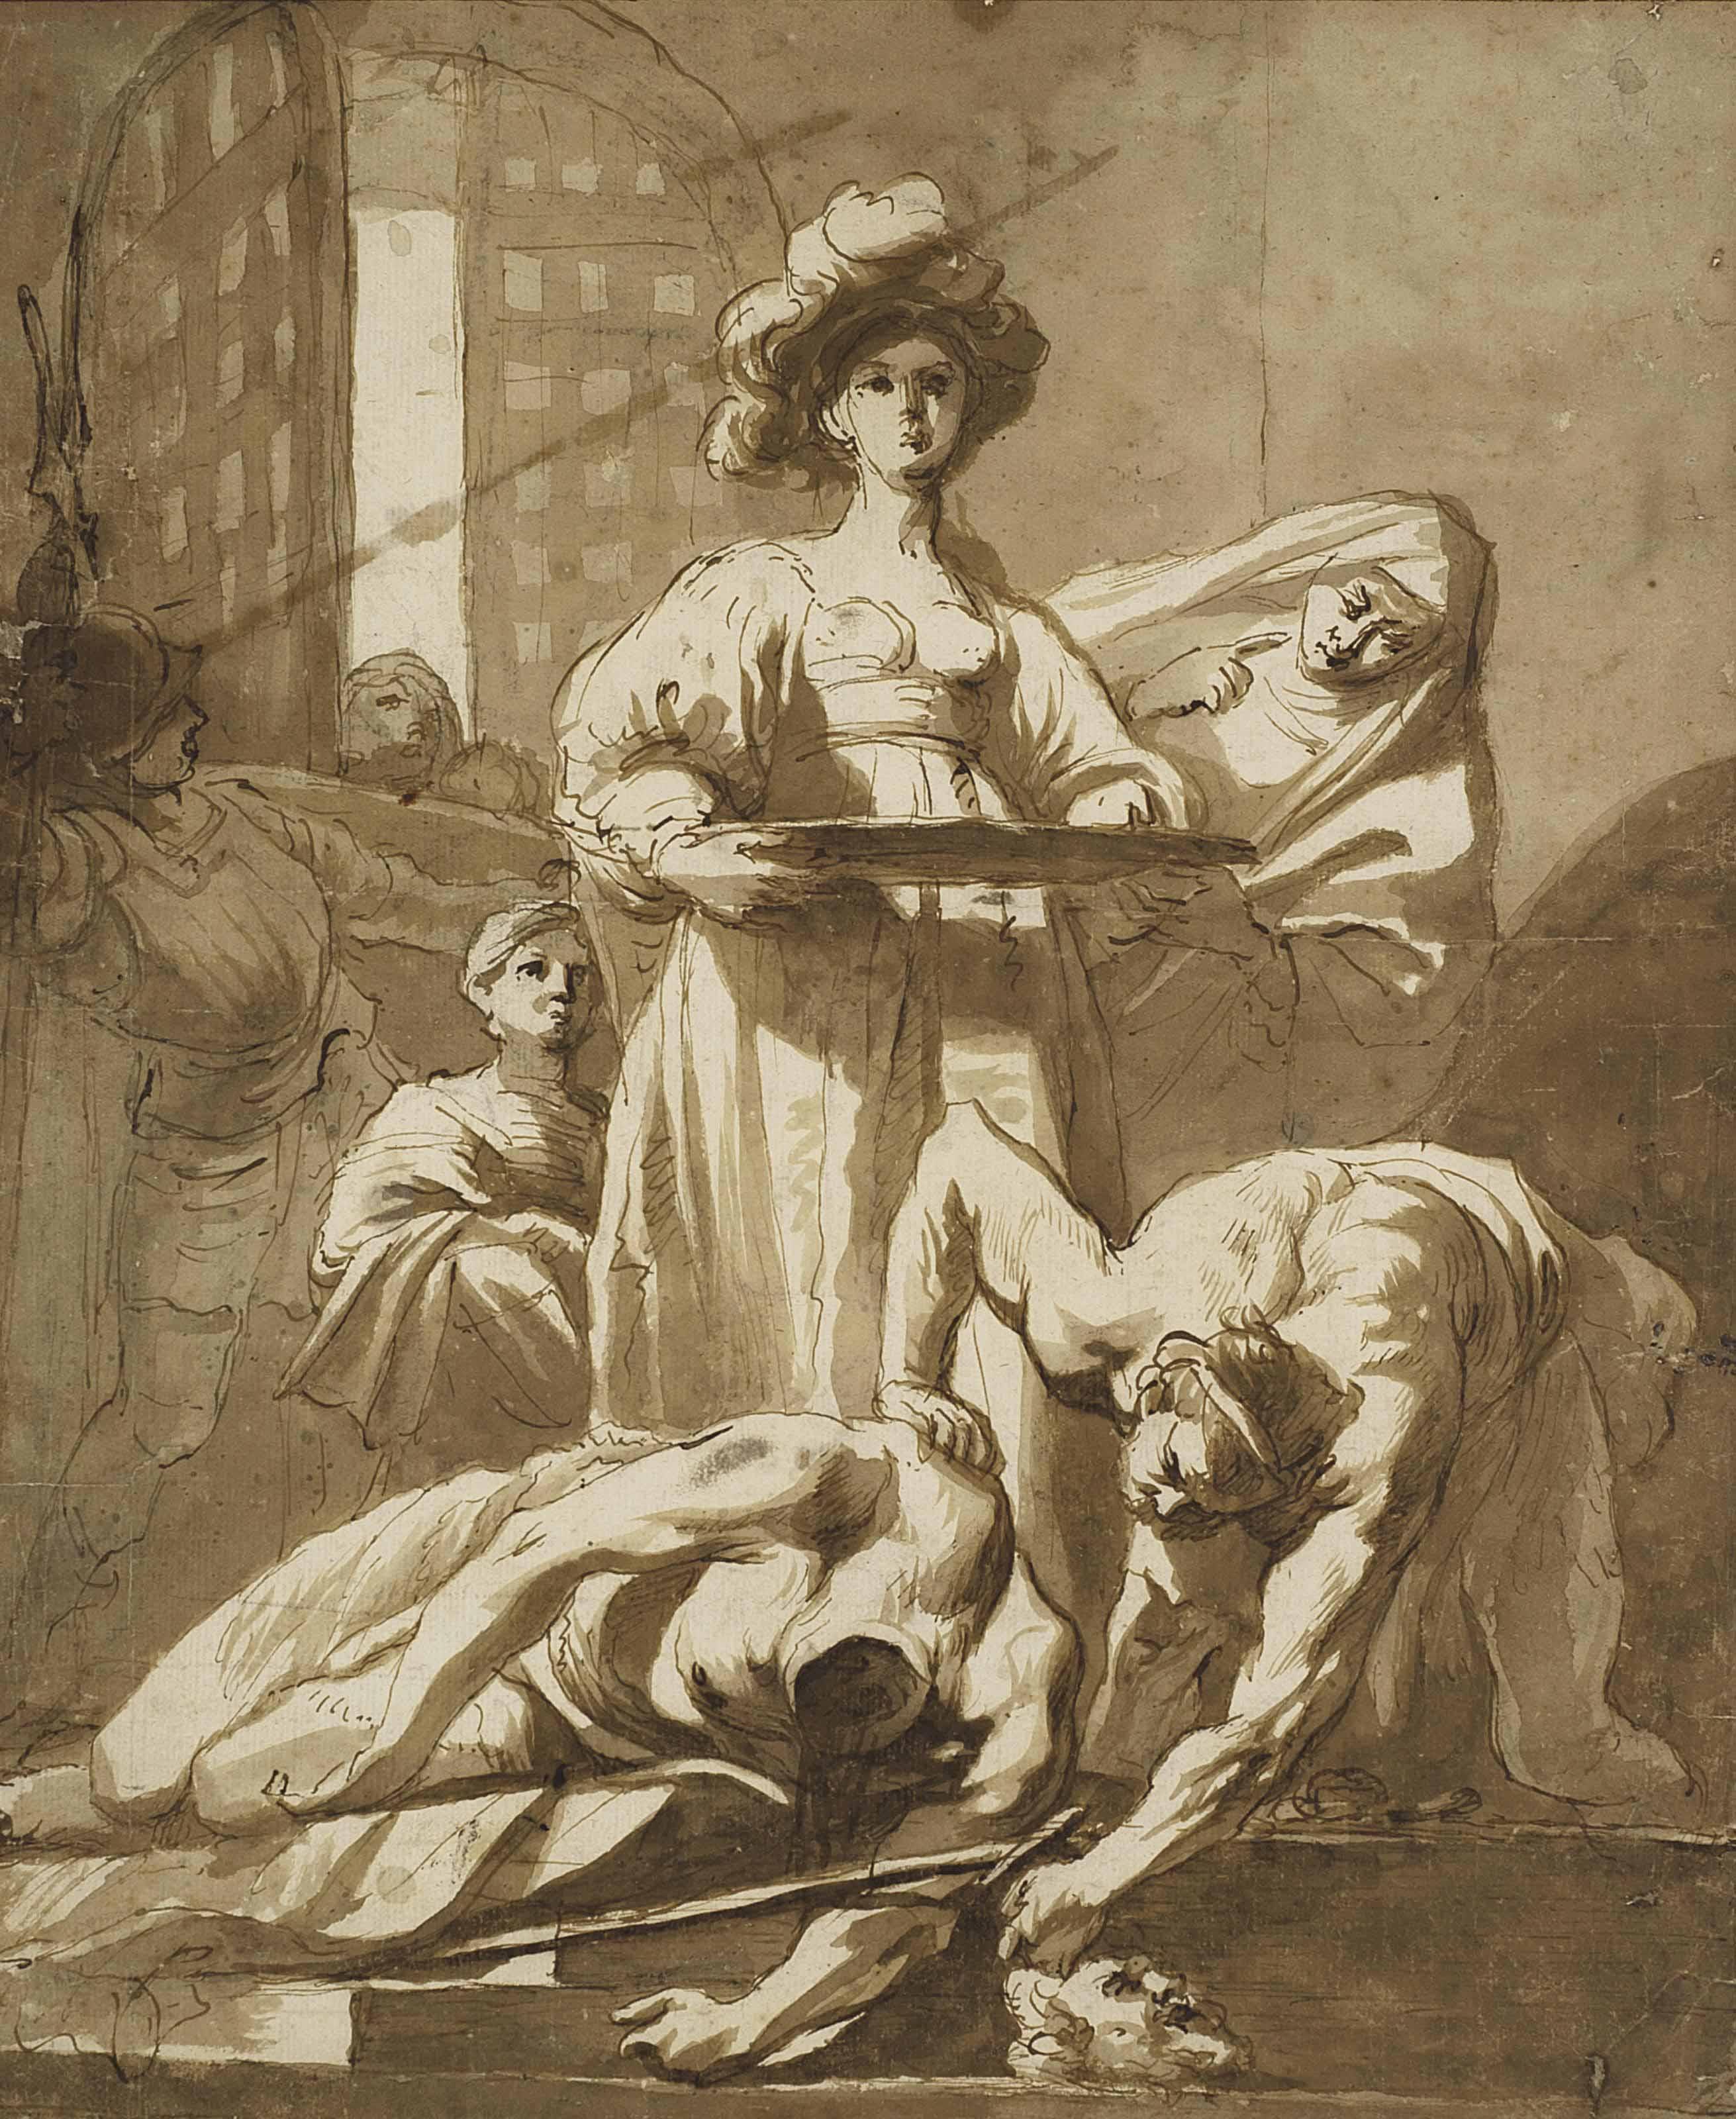 NICOLAUS KNUPFER (LEIPZIG 1603